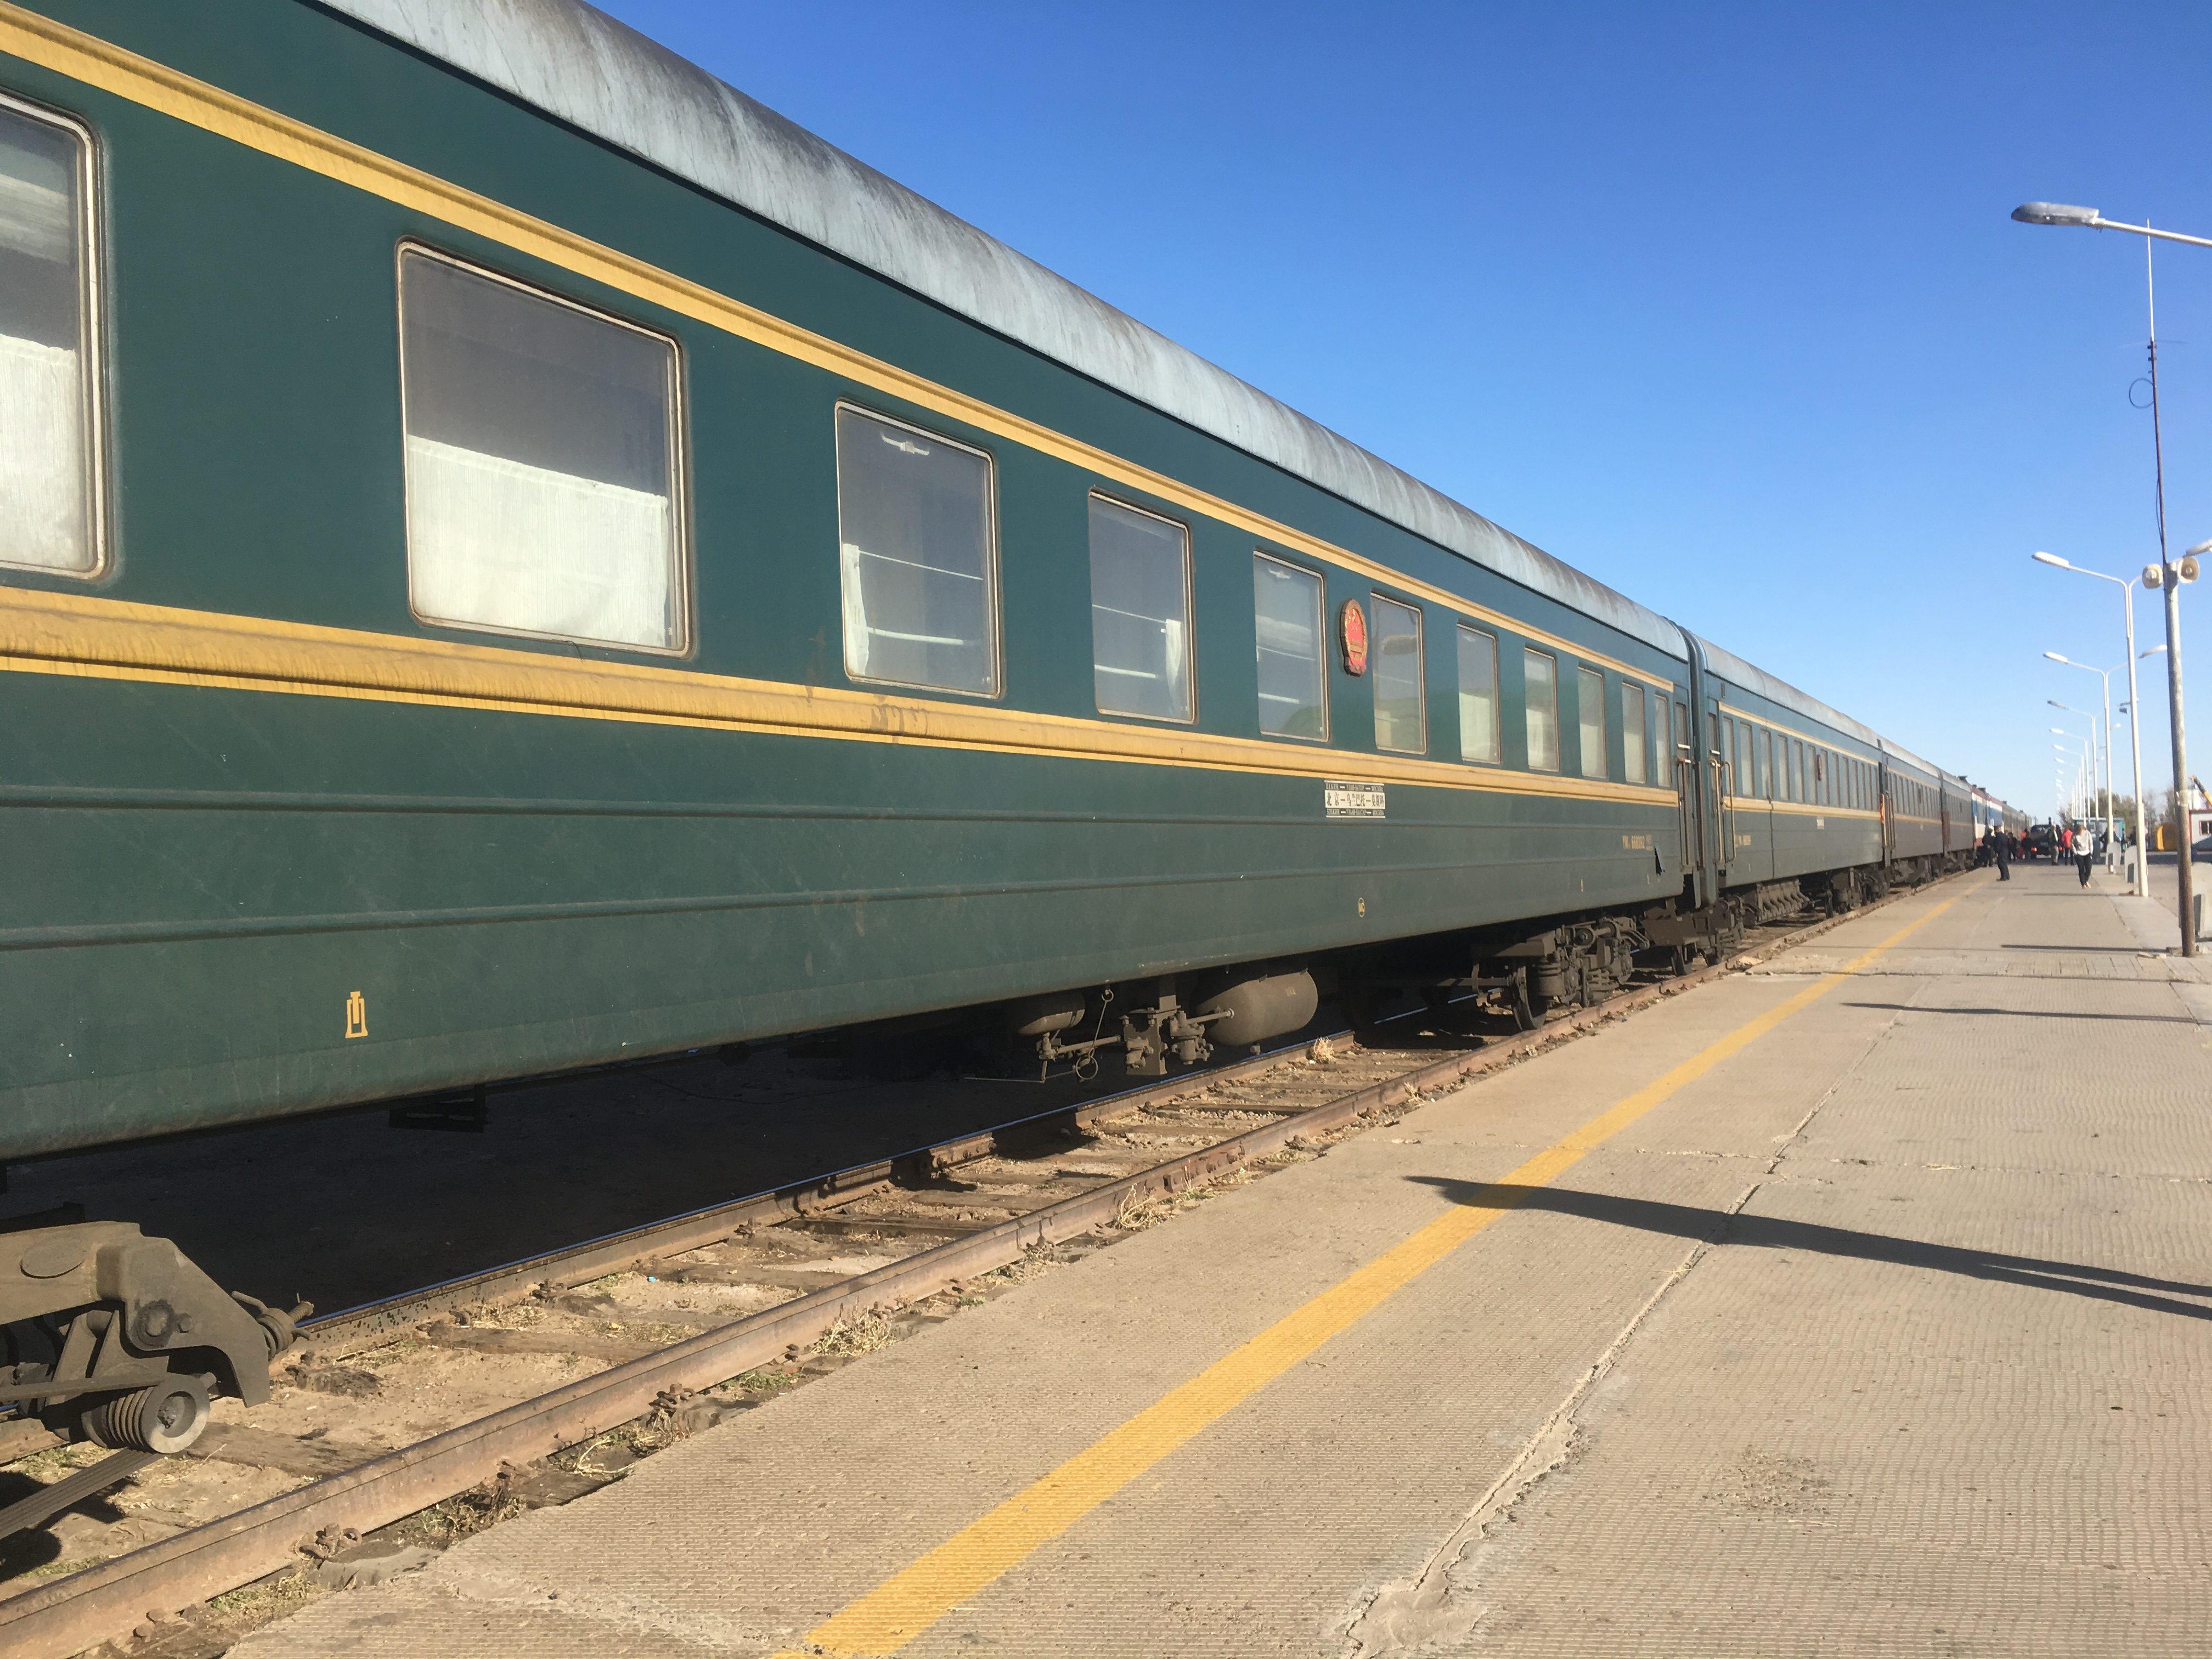 Chinese carriages along the Dornogovi platform